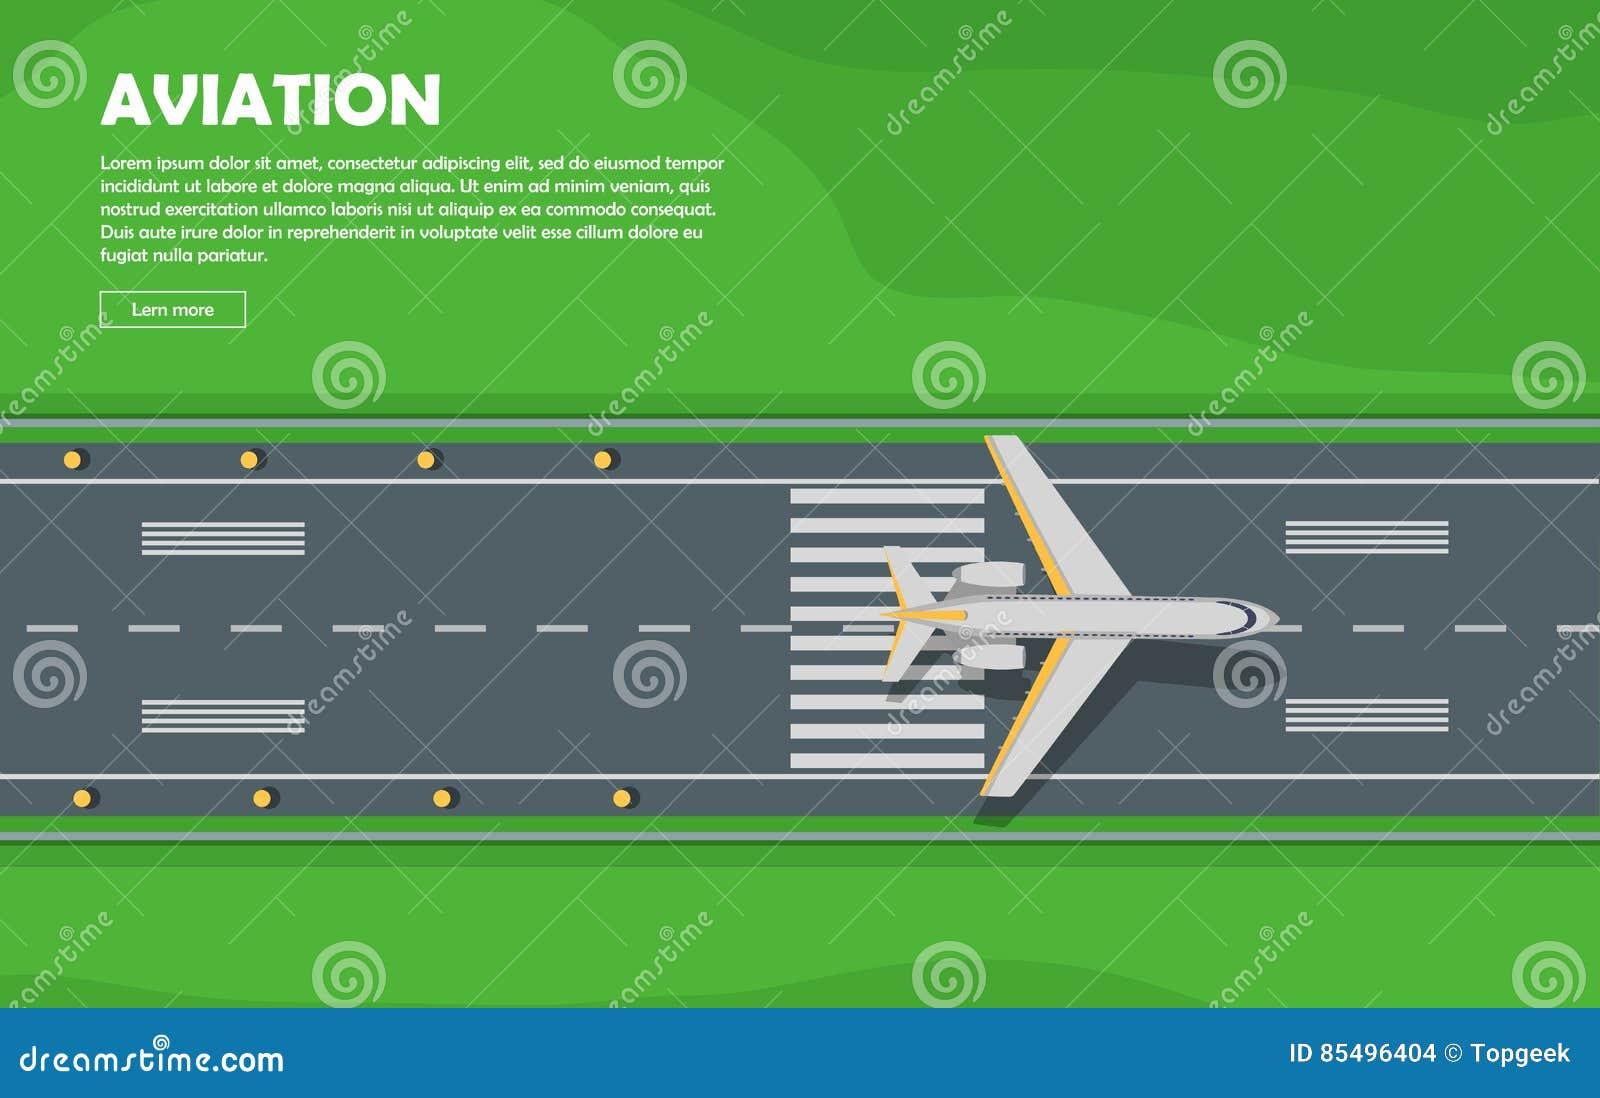 Aviation. Aircraft. Runway. Flight. Vector Banner